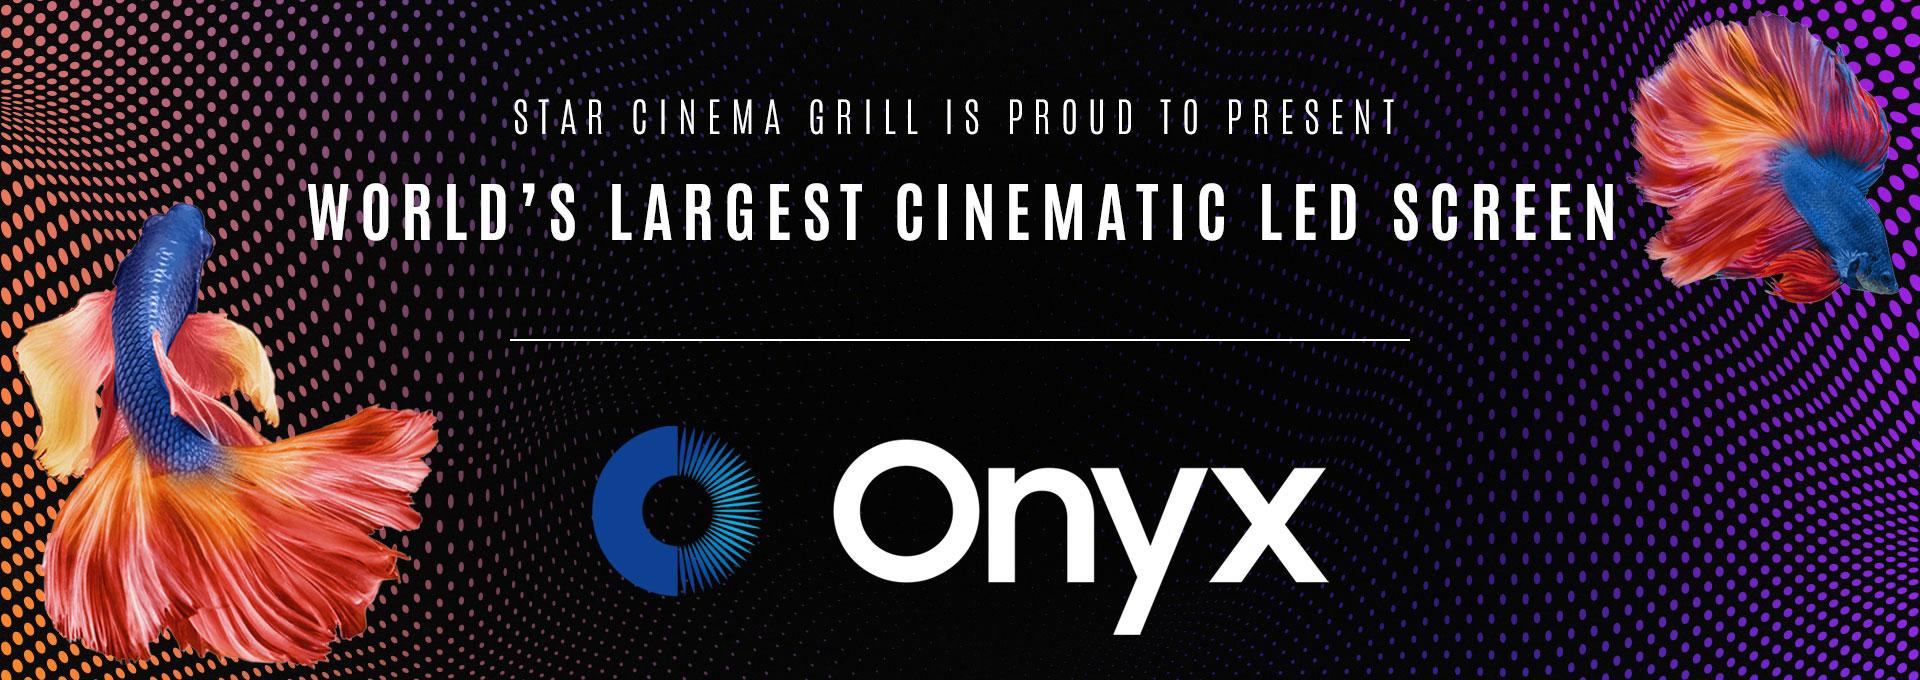 Richmond Onyx image